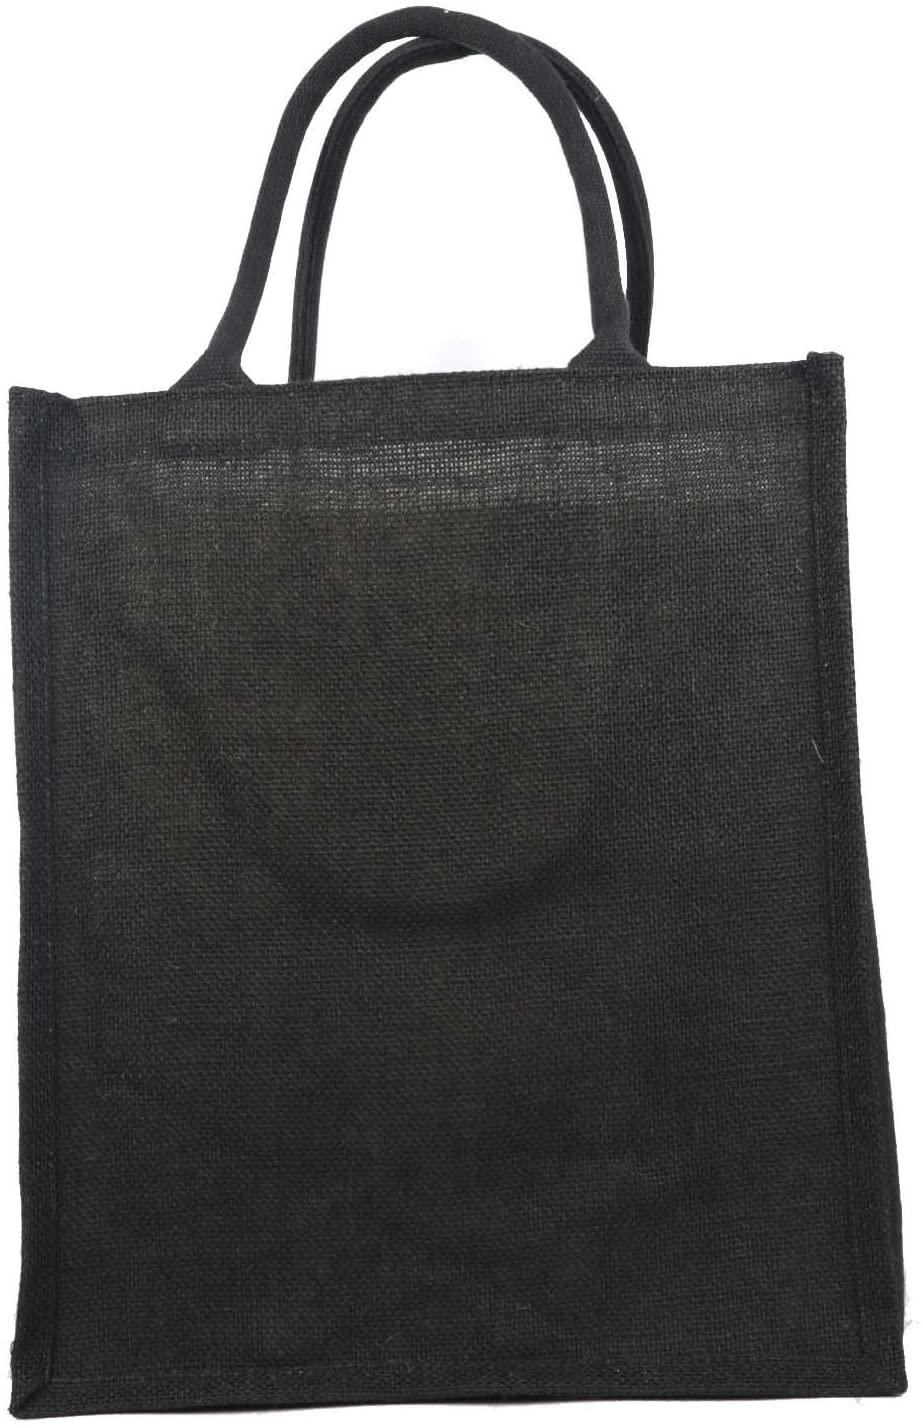 6 Bottle Wine Beer Bag, Jute Burlap Gift Carrier Tote Reusable Eco-Friendly Bags, Size 7.5